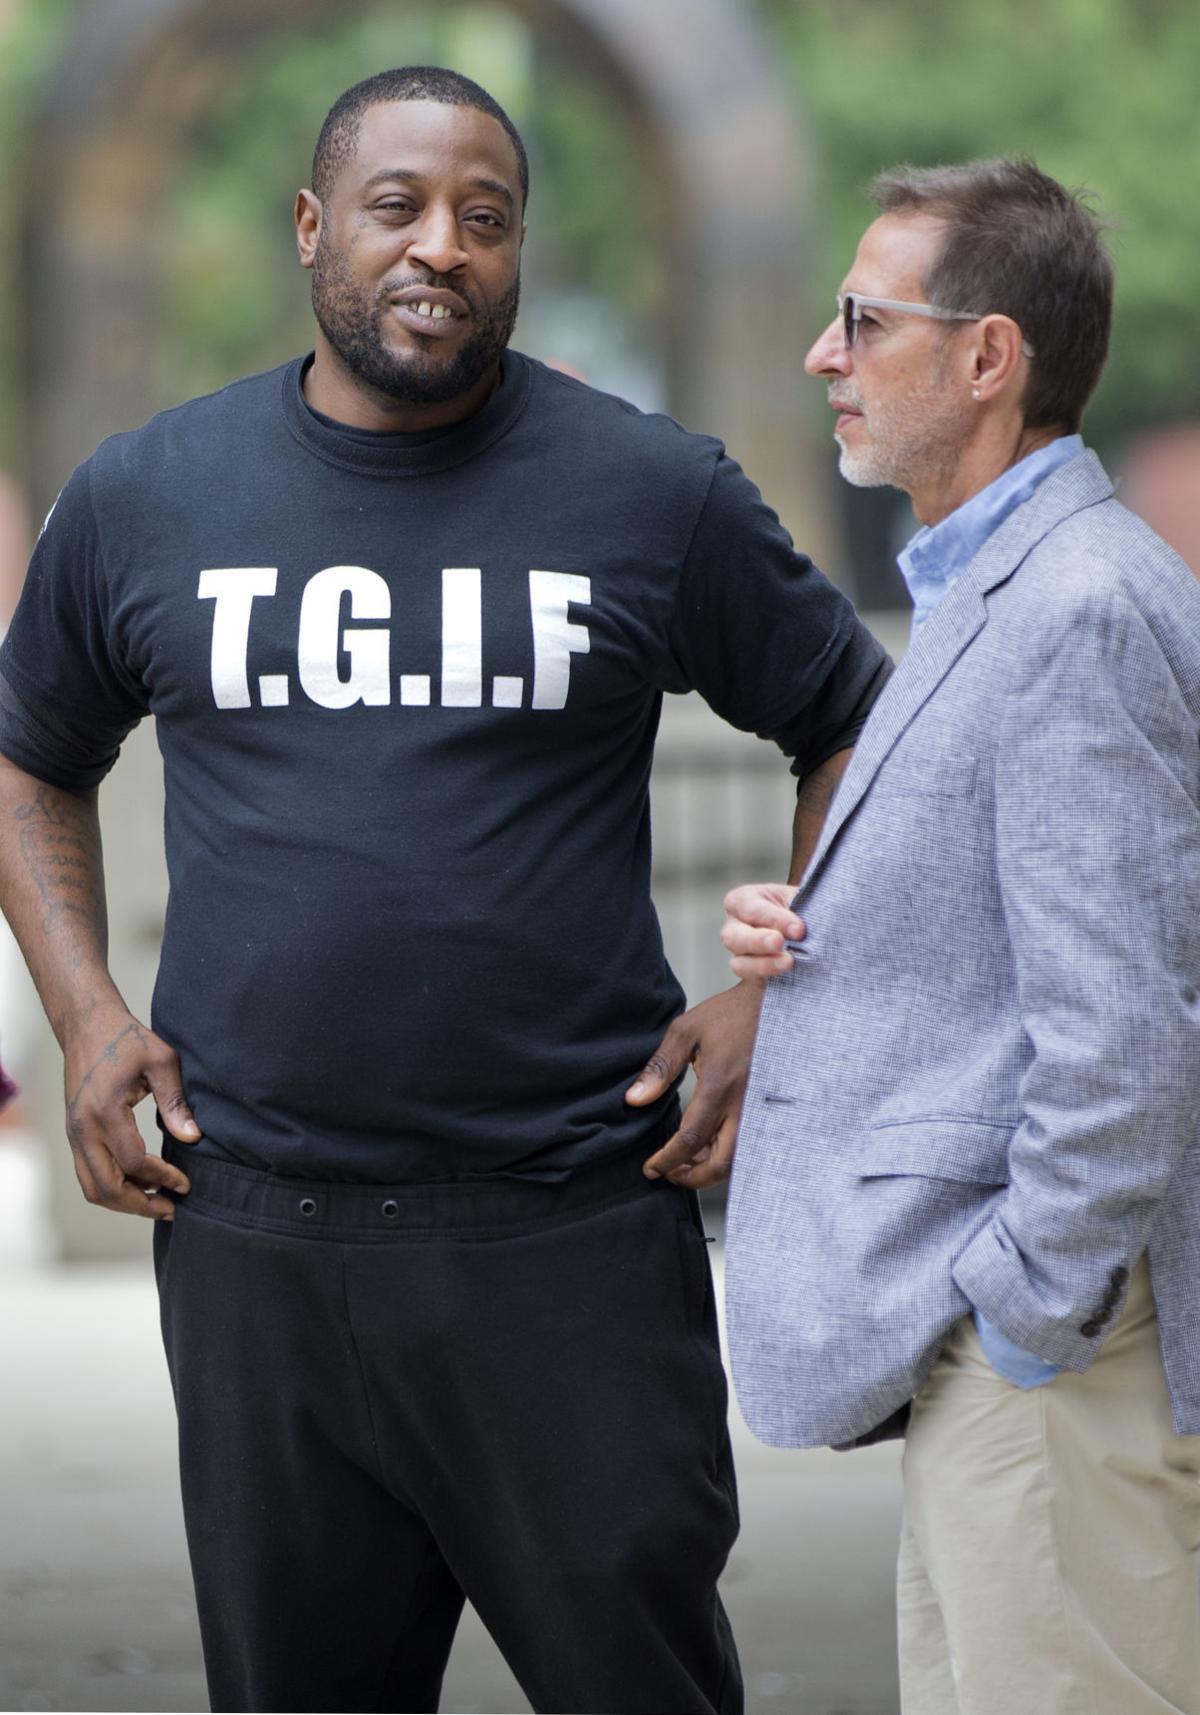 Greensboro man involved in police mistreatment case back in jail